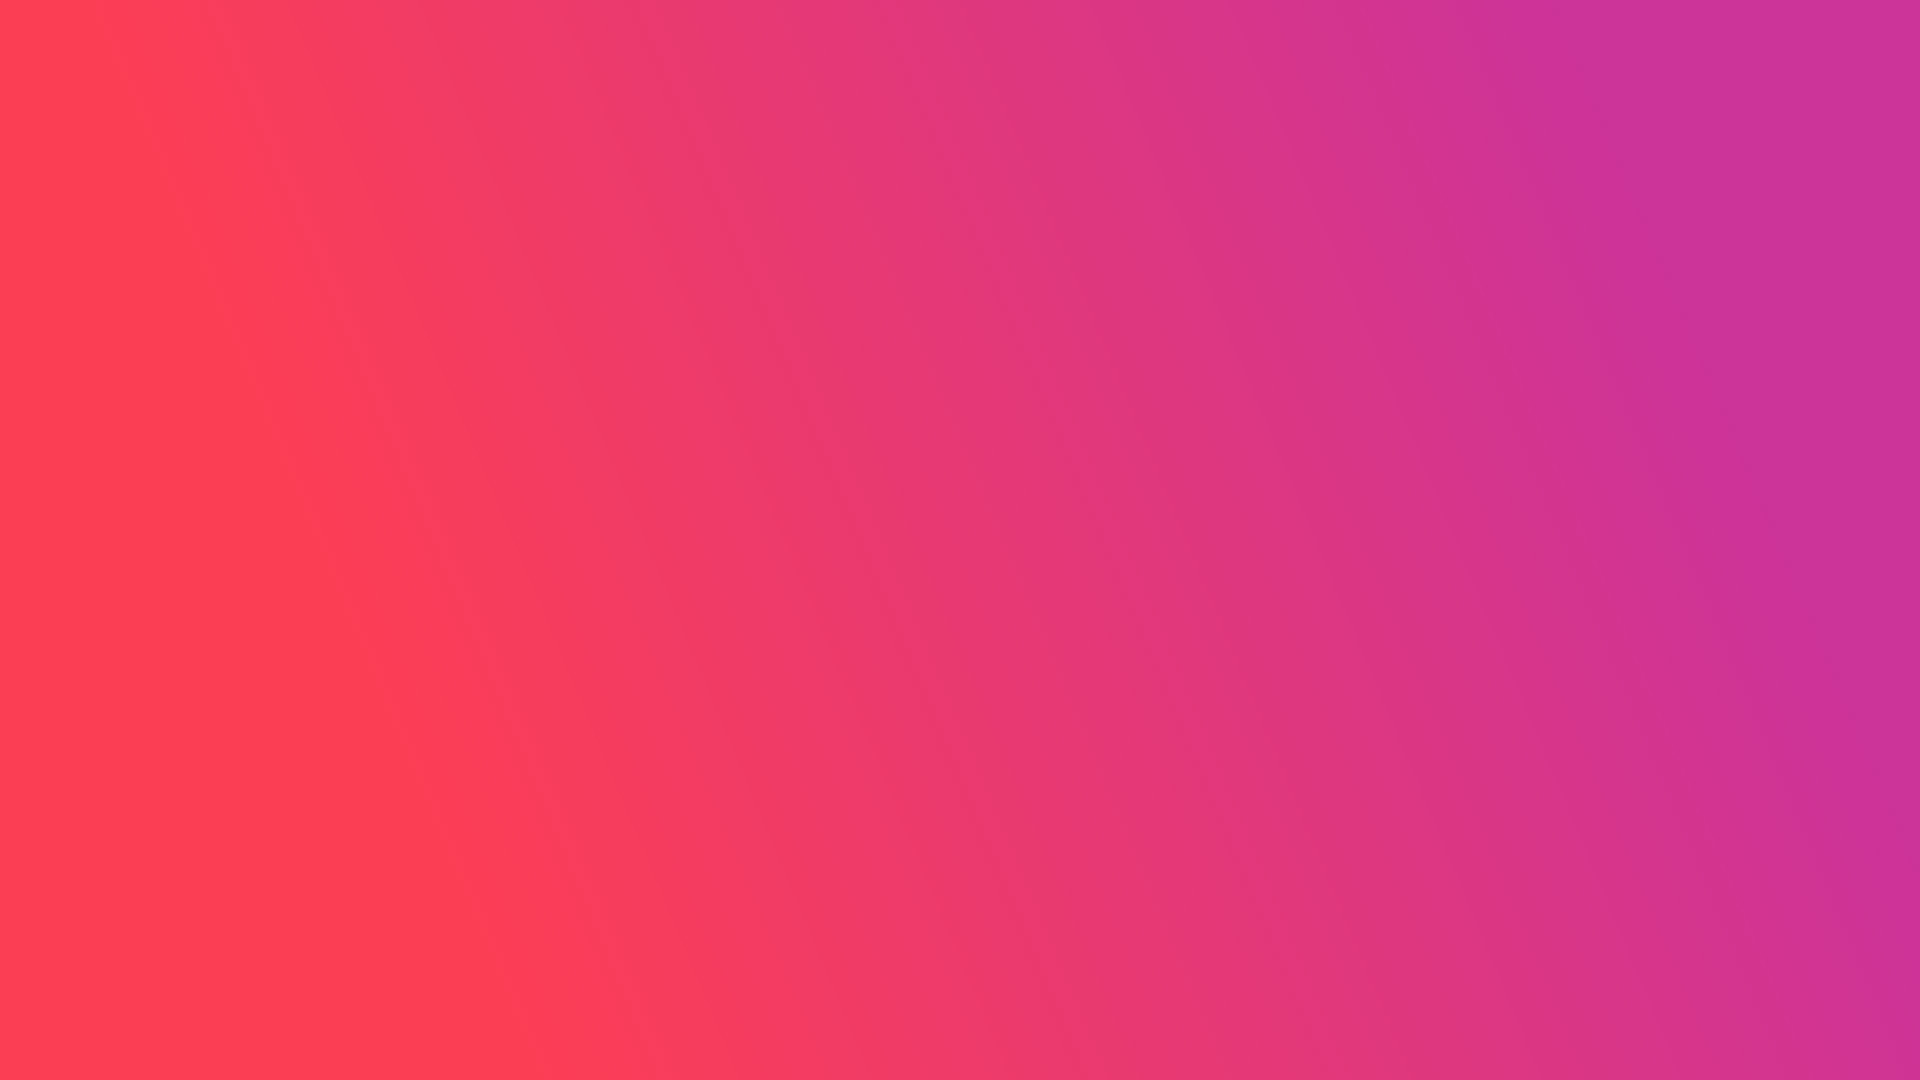 Corporate Design und Farbkombination